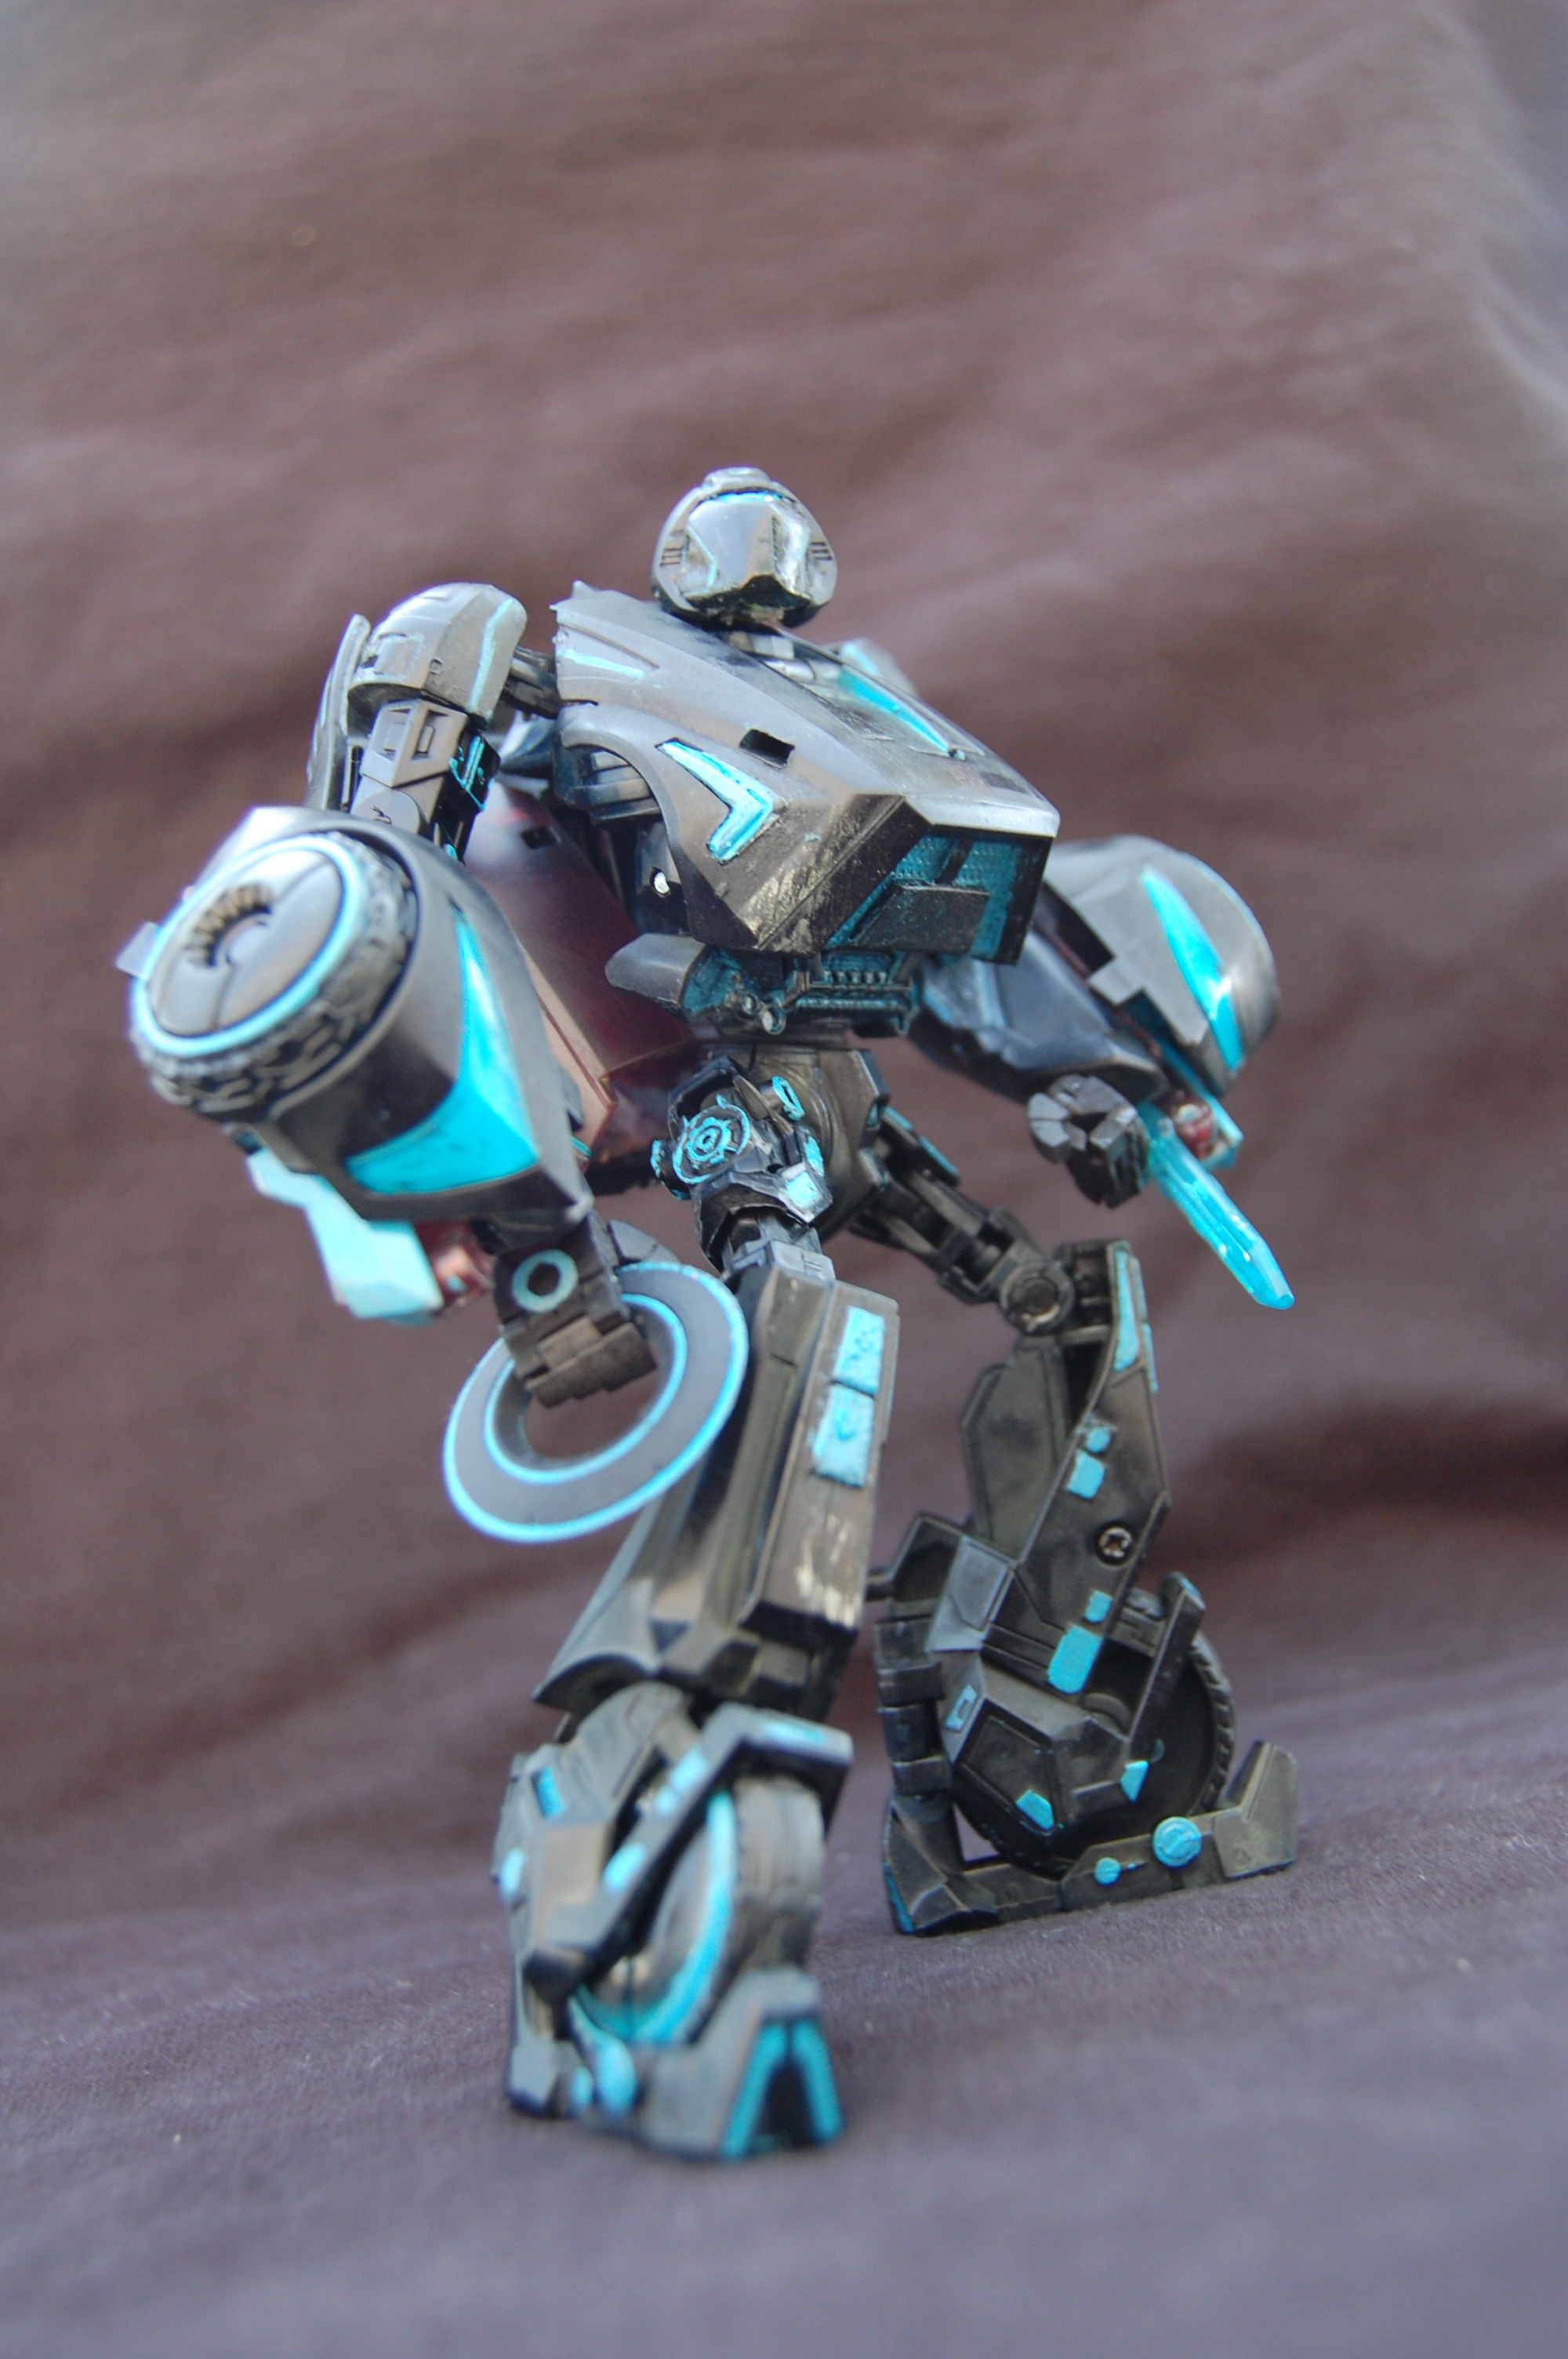 tron x Transformers